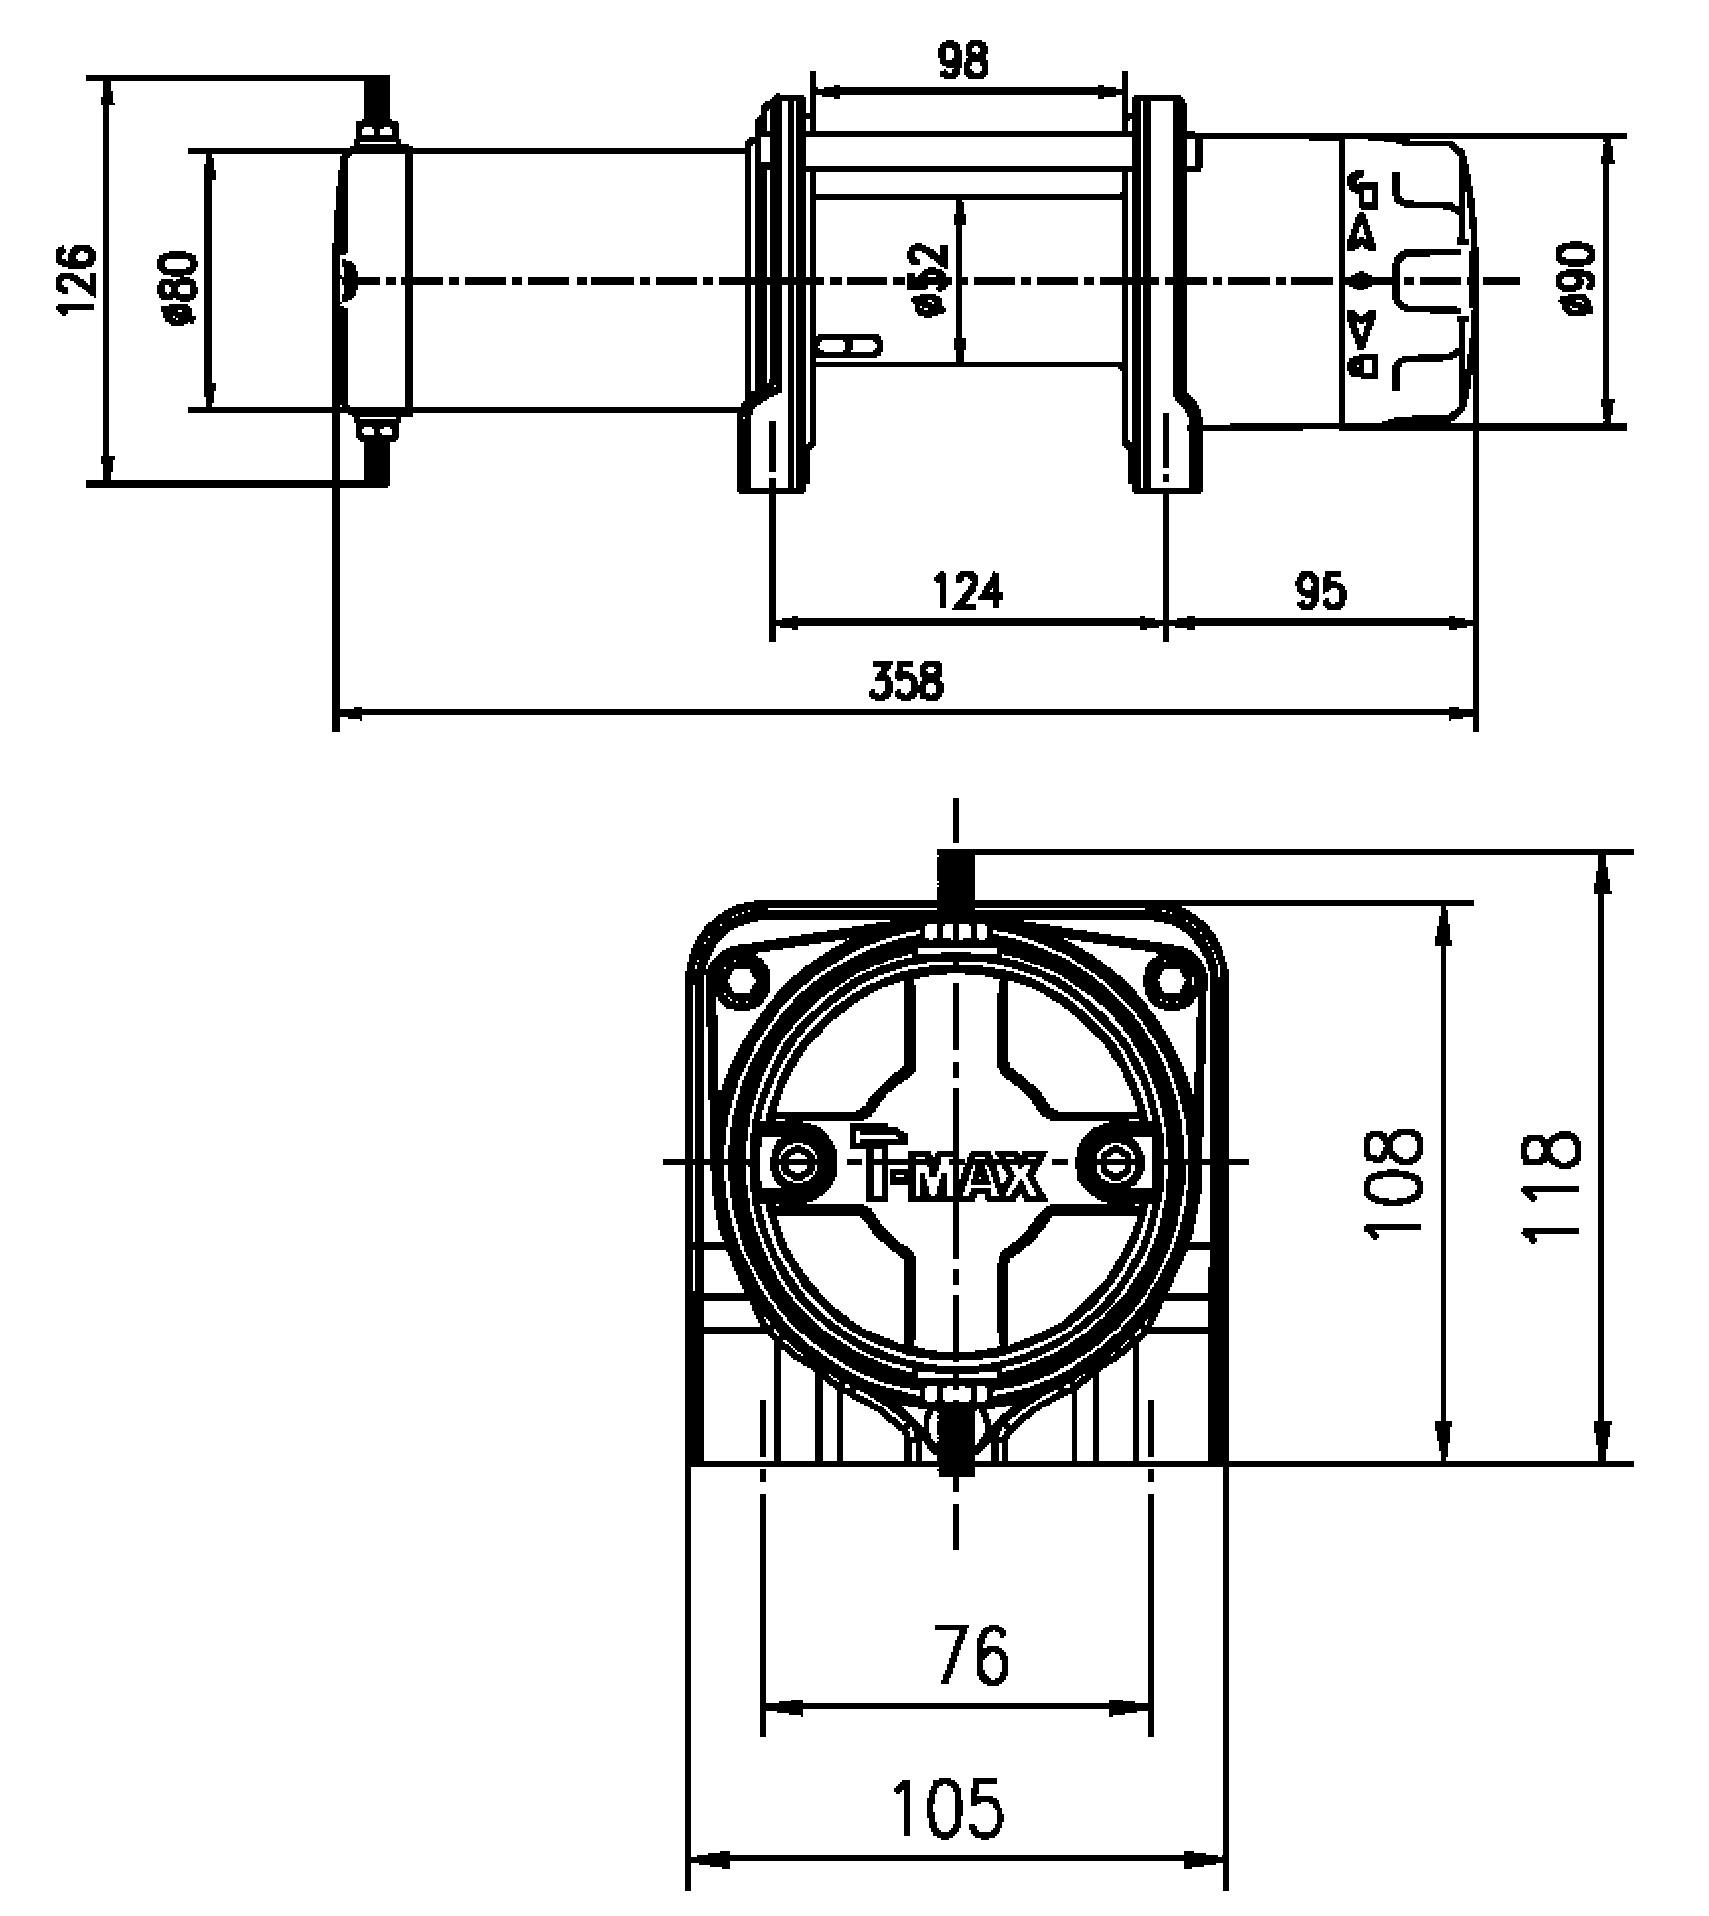 [SCHEMATICS_4PO]  F304A46 Imax Winch Wiring Diagram 12v | Wiring Resources | T Max Winch Wiring Diagram |  | Wiring Resources